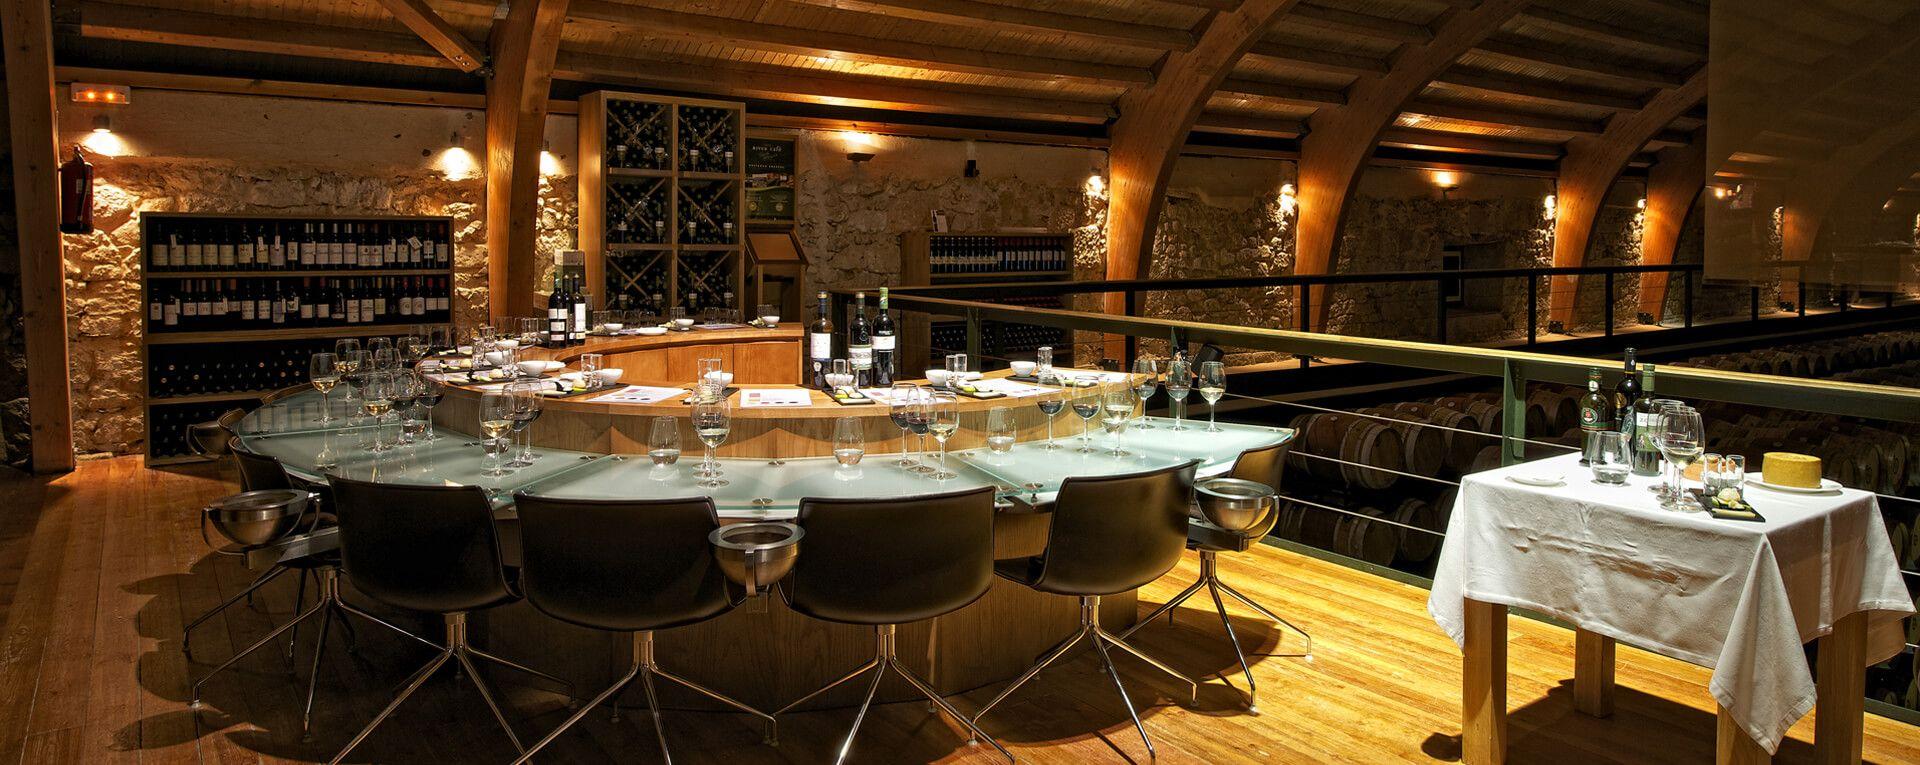 Hacienda Zorita Wine Hotel & Spa, Spain